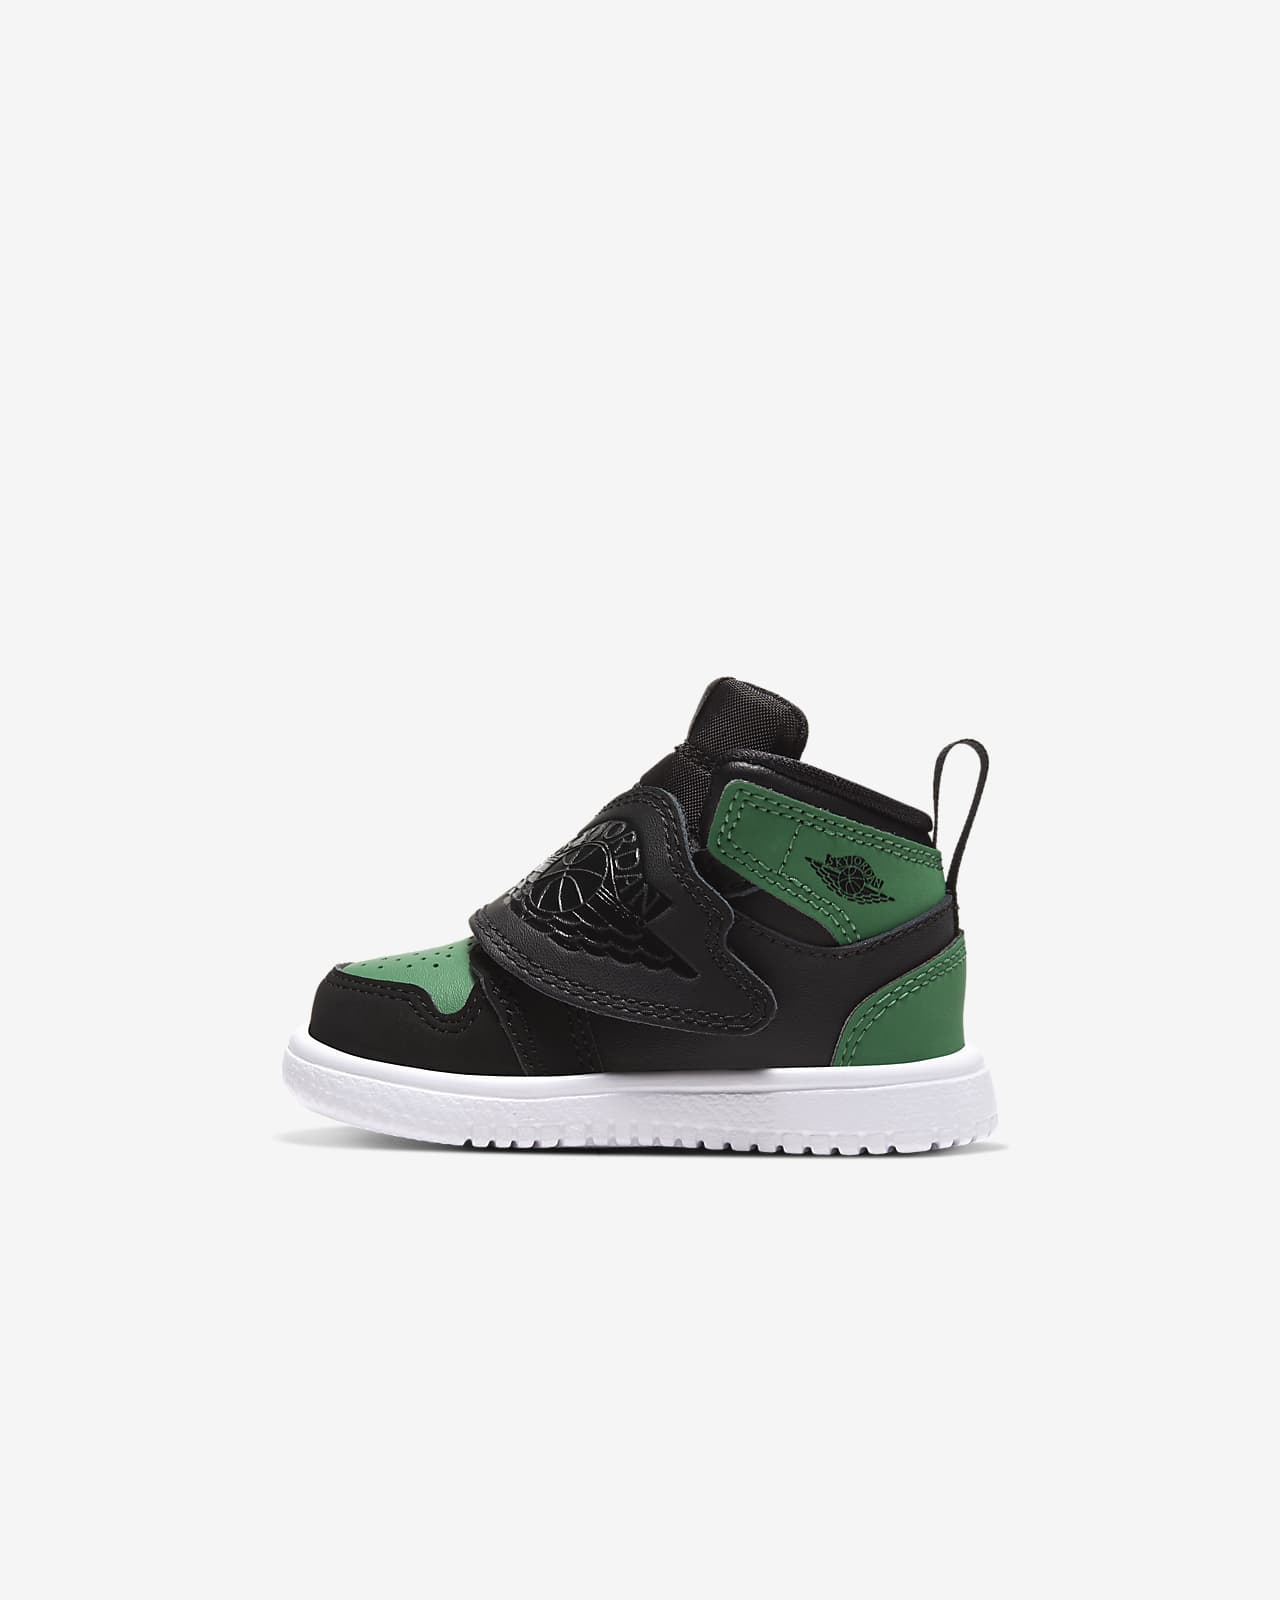 Sky Jordan 1 Baby and Toddler Shoe. Nike SI